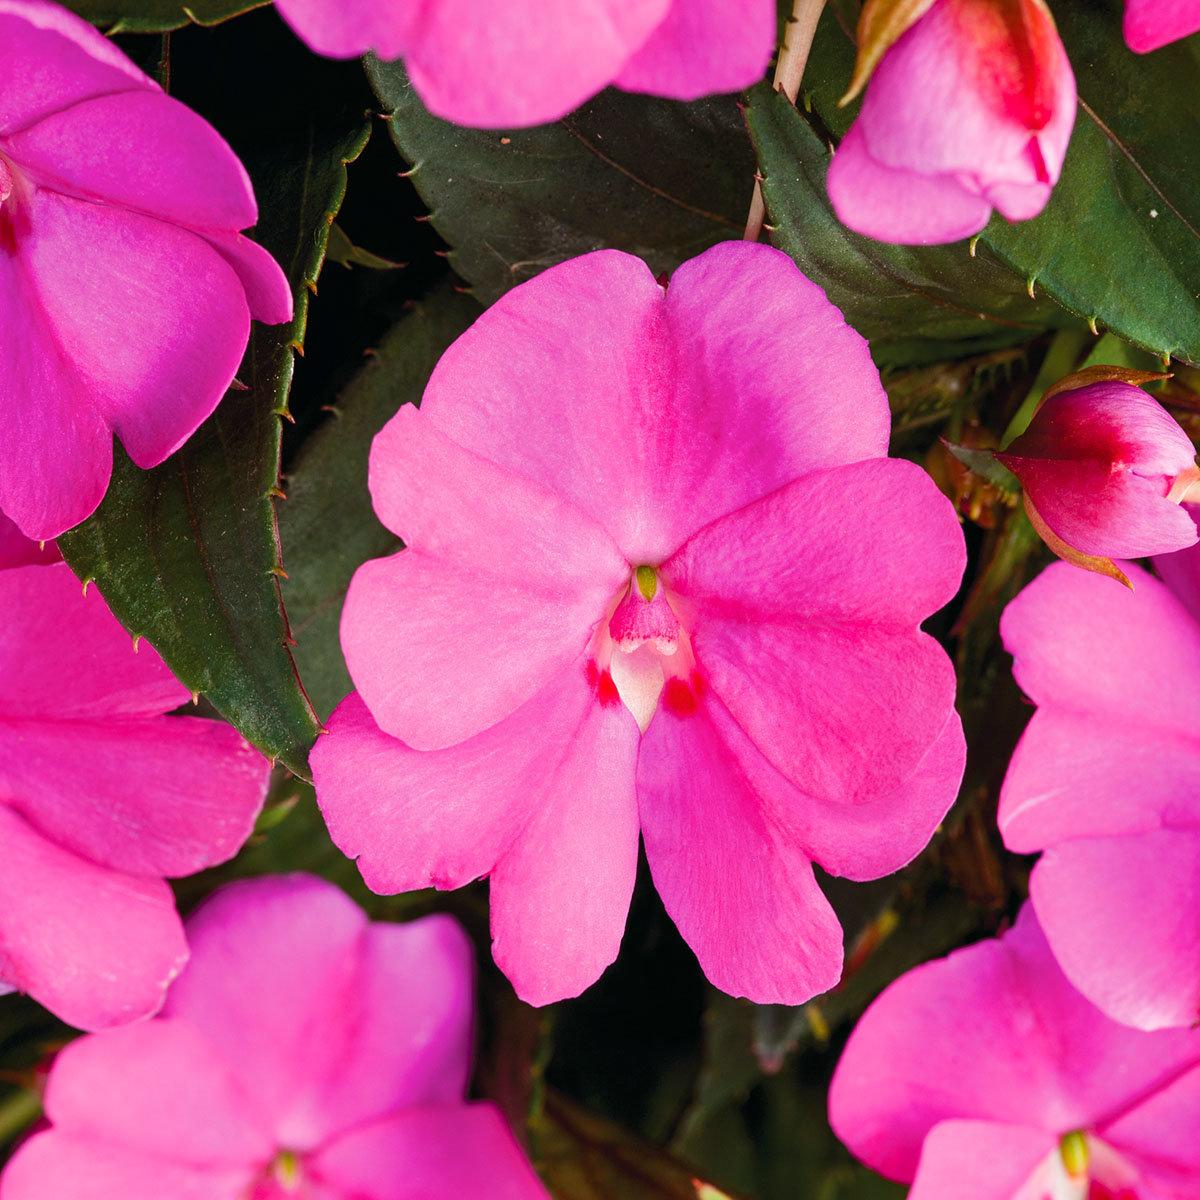 Edellieschen, lila, im ca. 12 cm-Topf